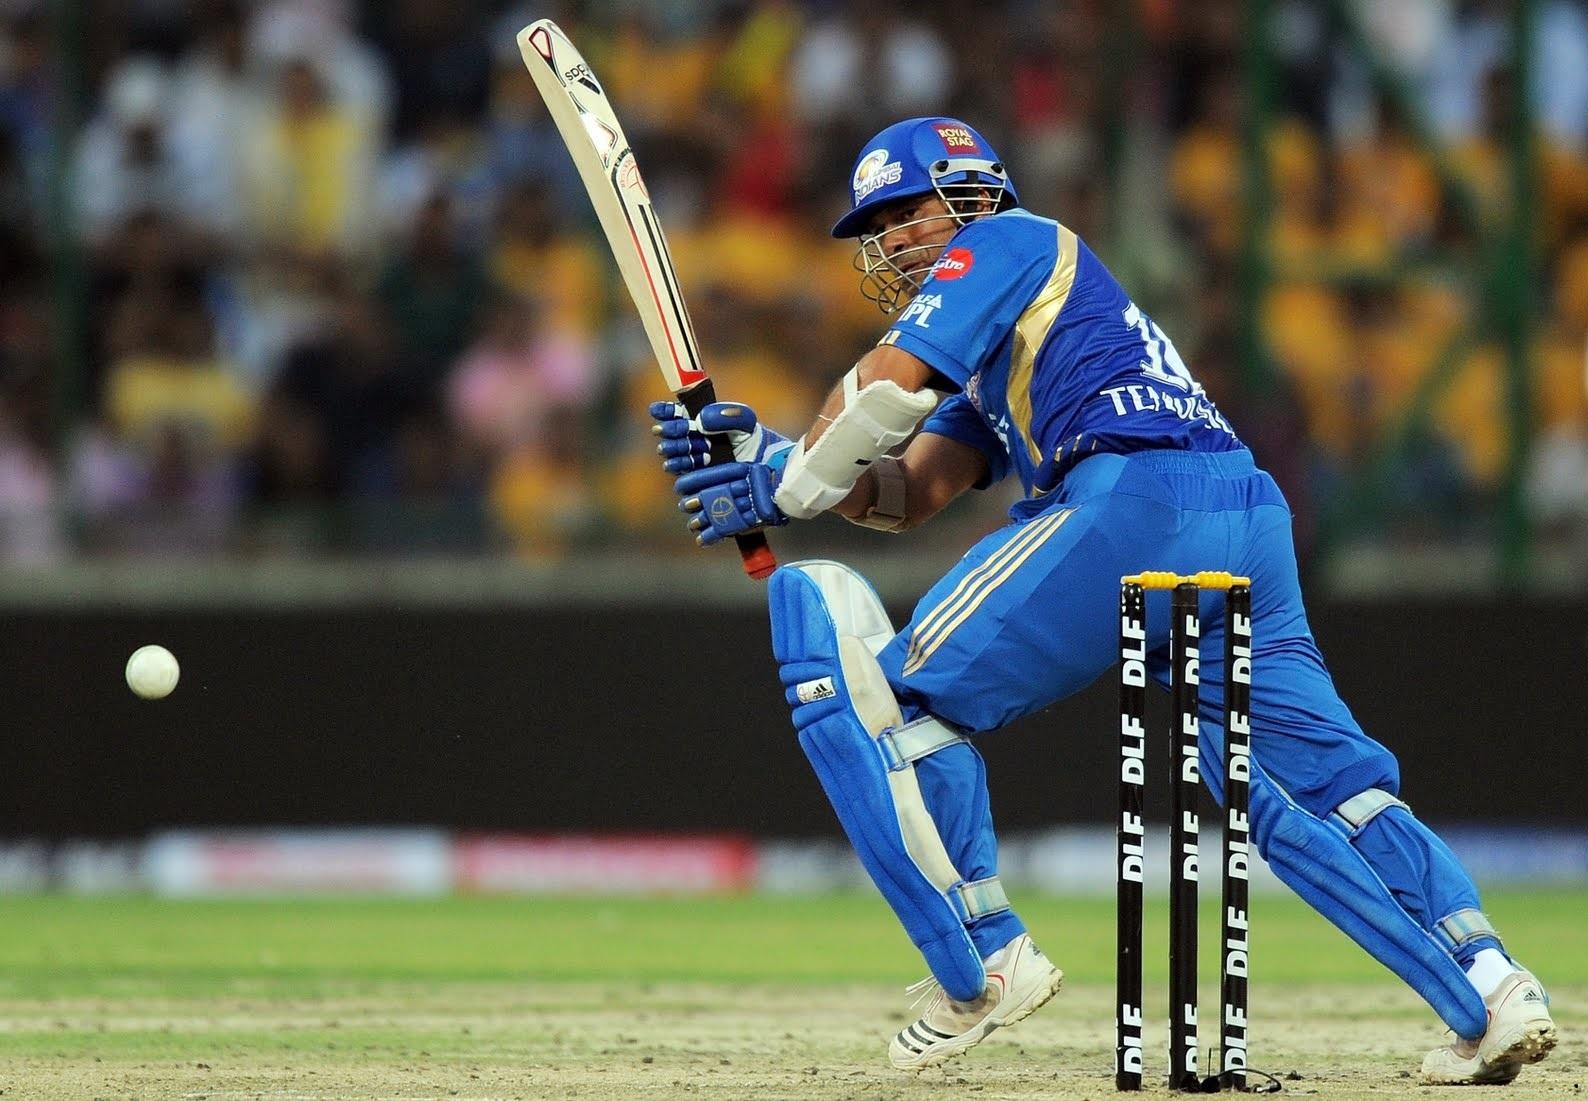 Cricket HD Wallpapers Widescreen - Cricket Live Scores ...